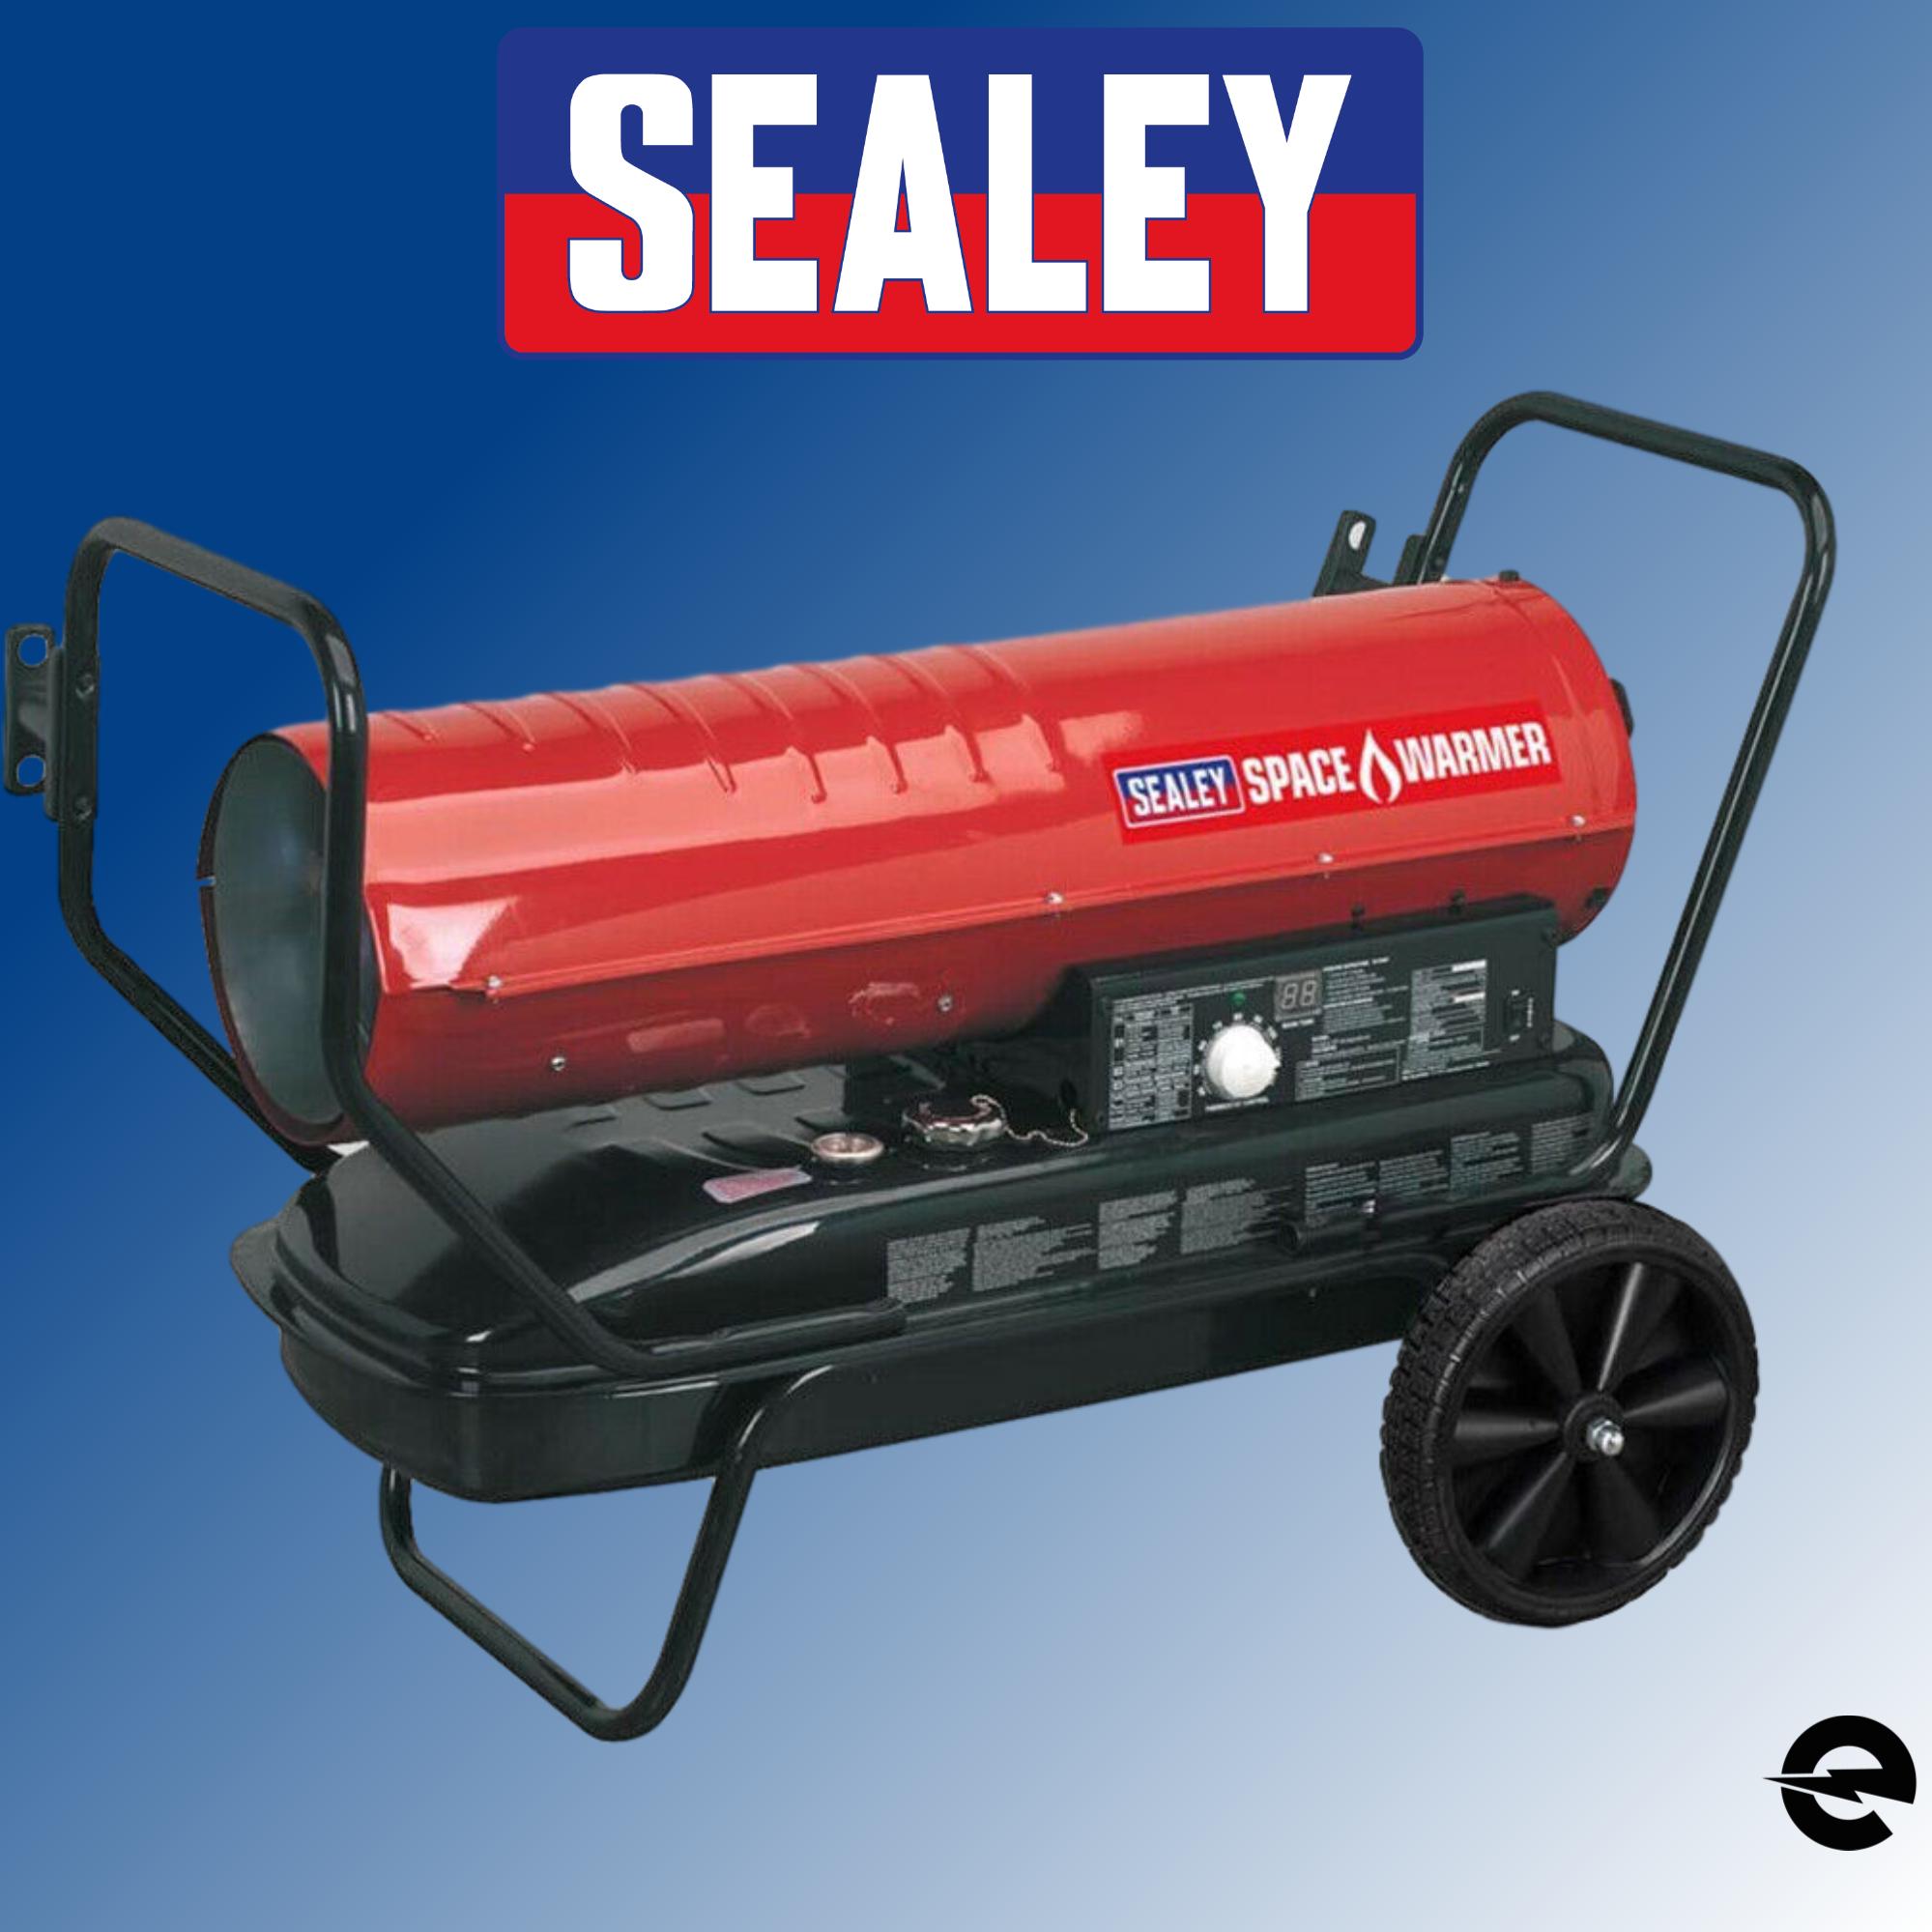 Sealey Eh2001 Industriel Ventilateur Chauffage 2 kW